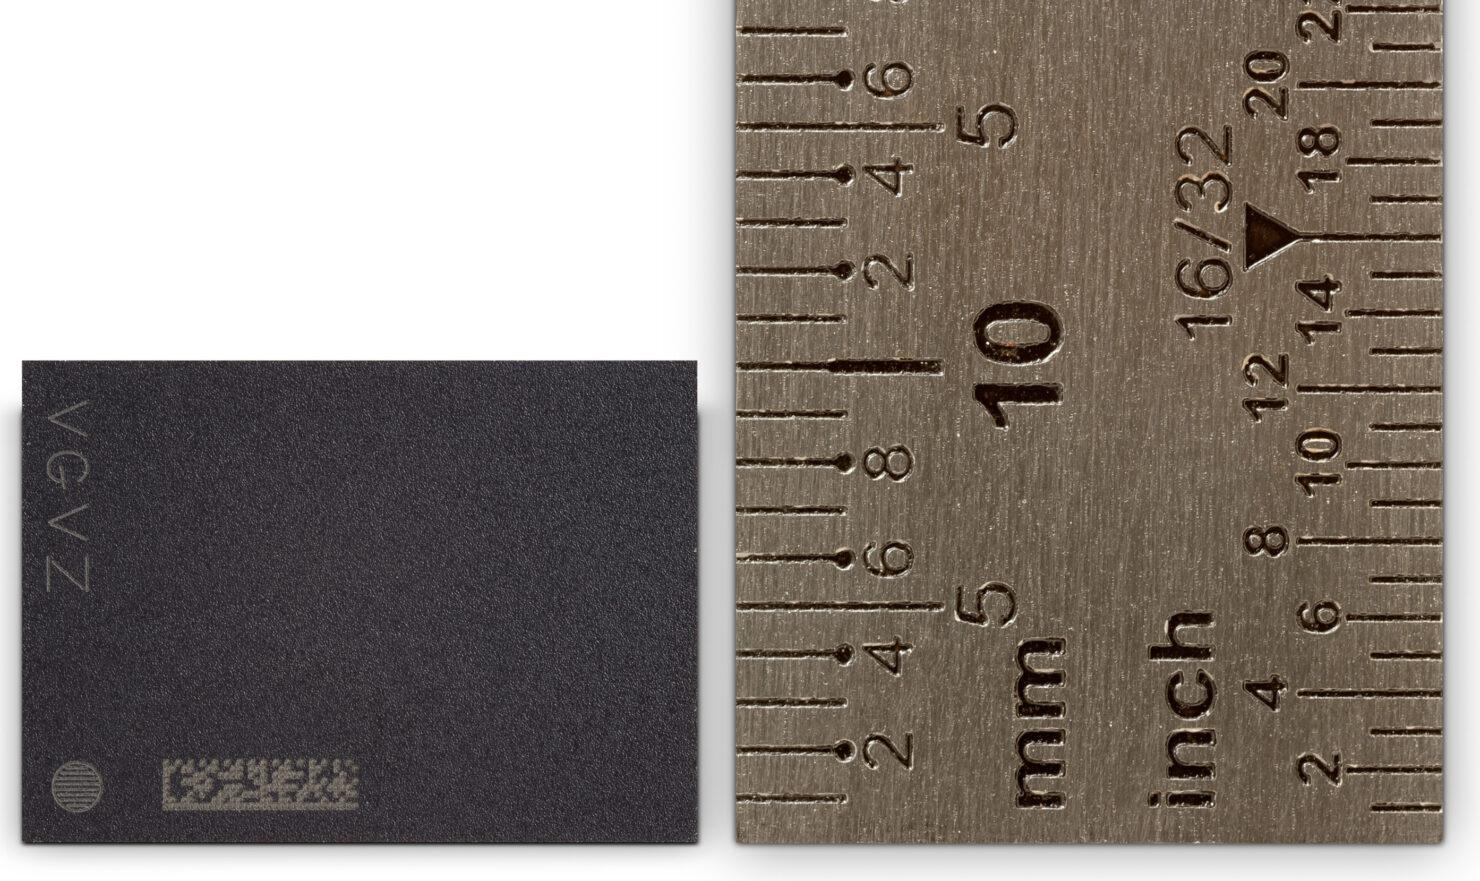 micron-gddr5x-sample_2